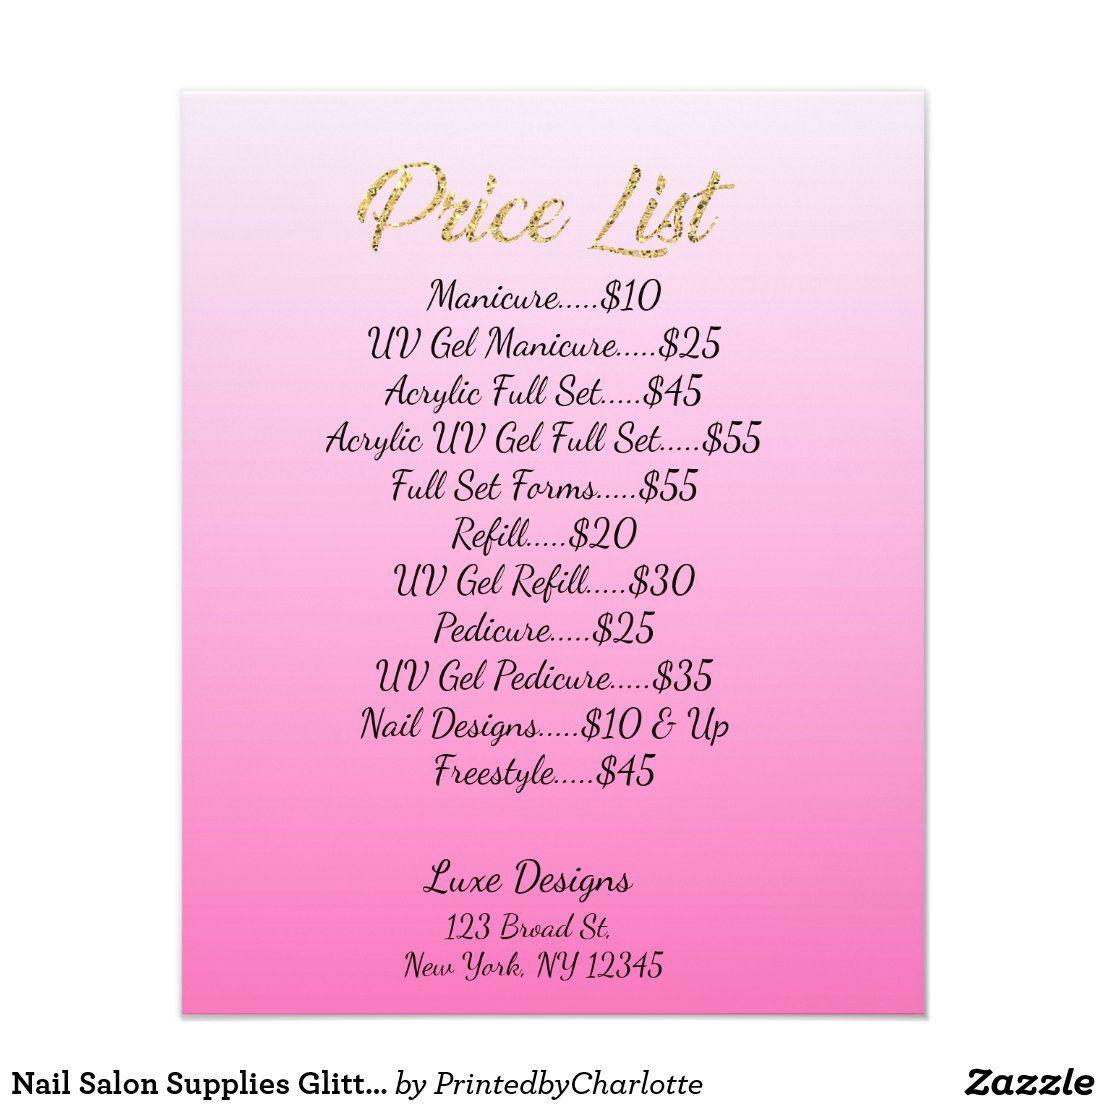 Nail Salon Supplies Glitter Drips Price List Flyer Zazzle Com In 2020 Nail Salon Supplies Nail Salon Design Nail Salon Prices